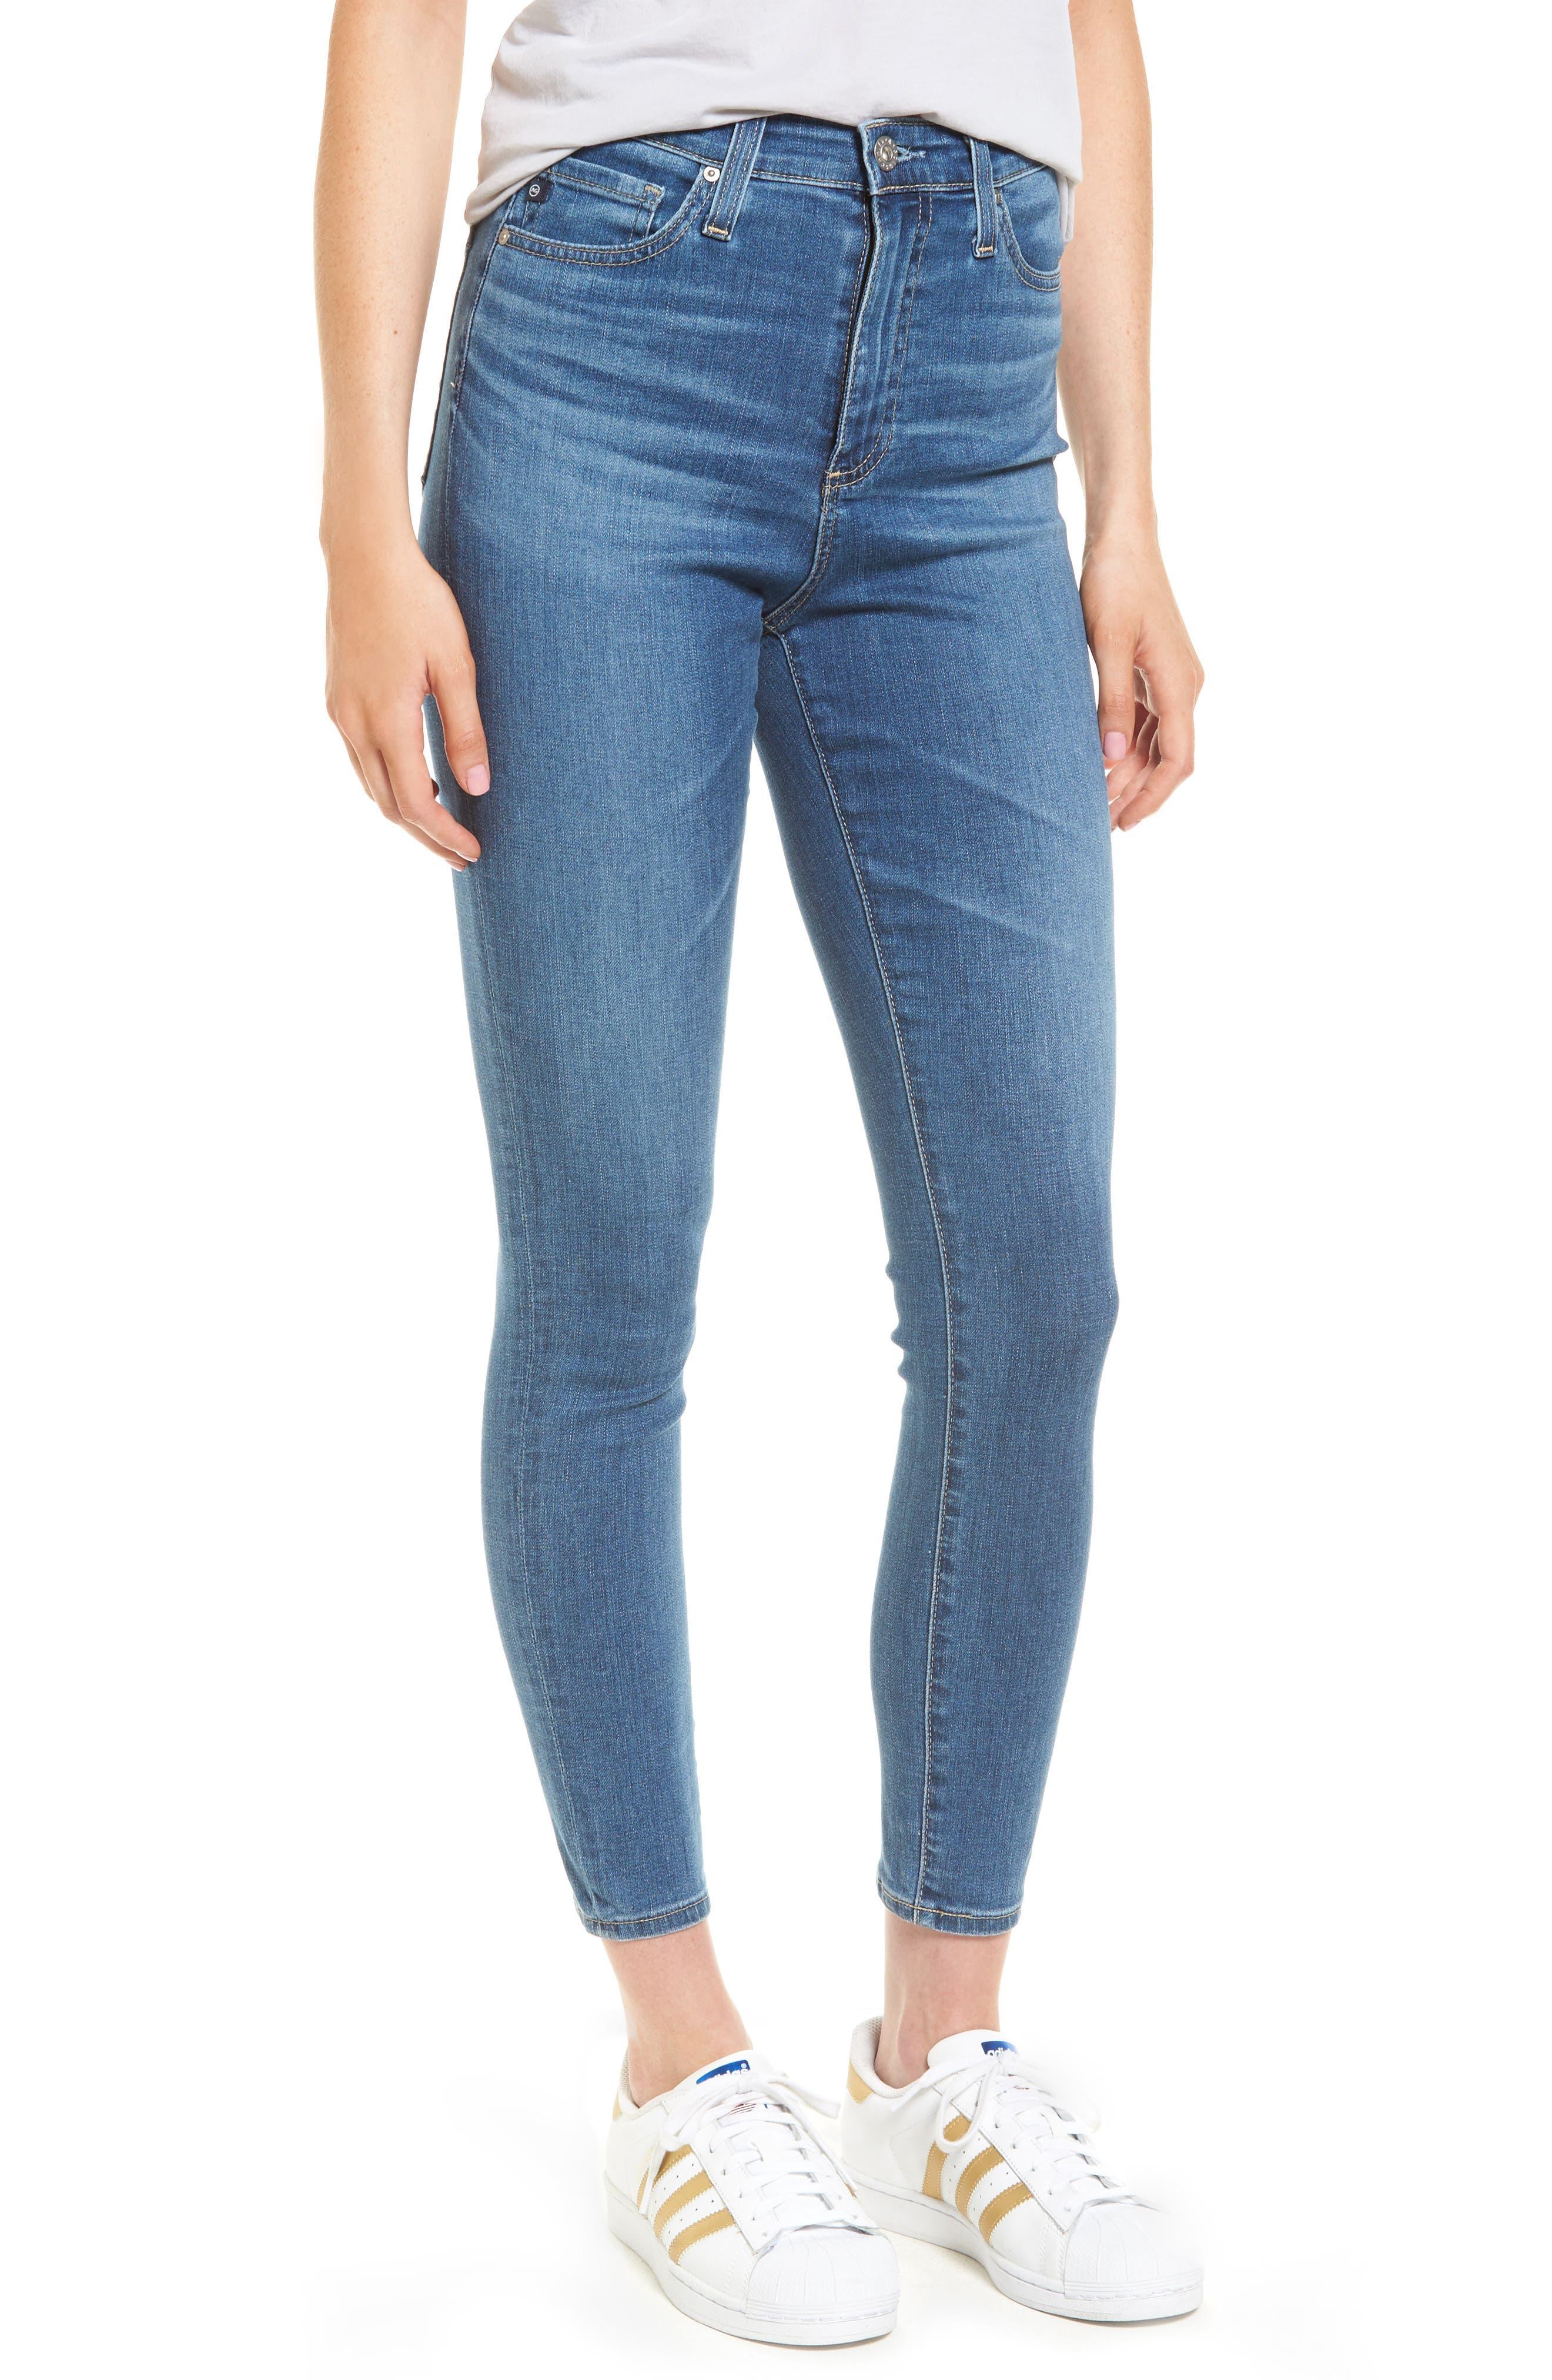 Mila High Waist Ankle Skinny Jeans,                             Main thumbnail 1, color,                             Indigo Viking